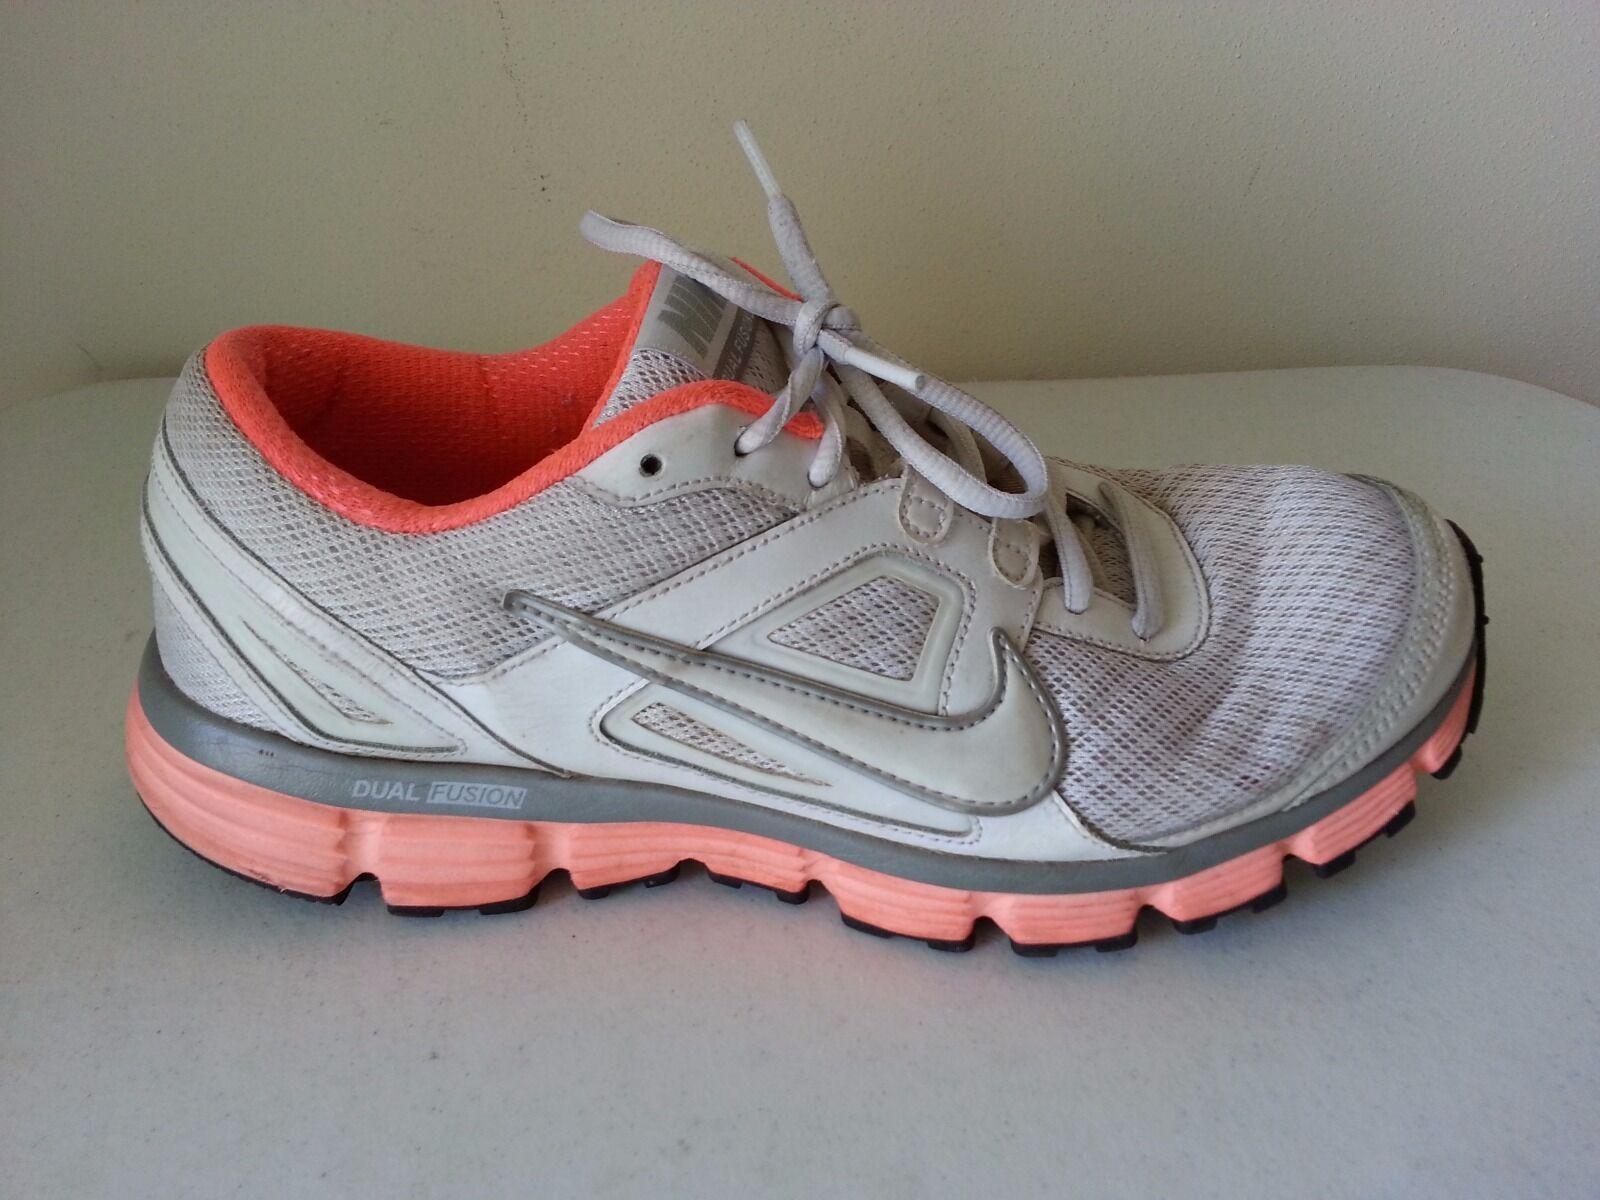 Nike doppia fushion fushion fushion san bianco e peach lace up - donne 10 '42   Le vendite online    Gentiluomo/Signora Scarpa  ce8432